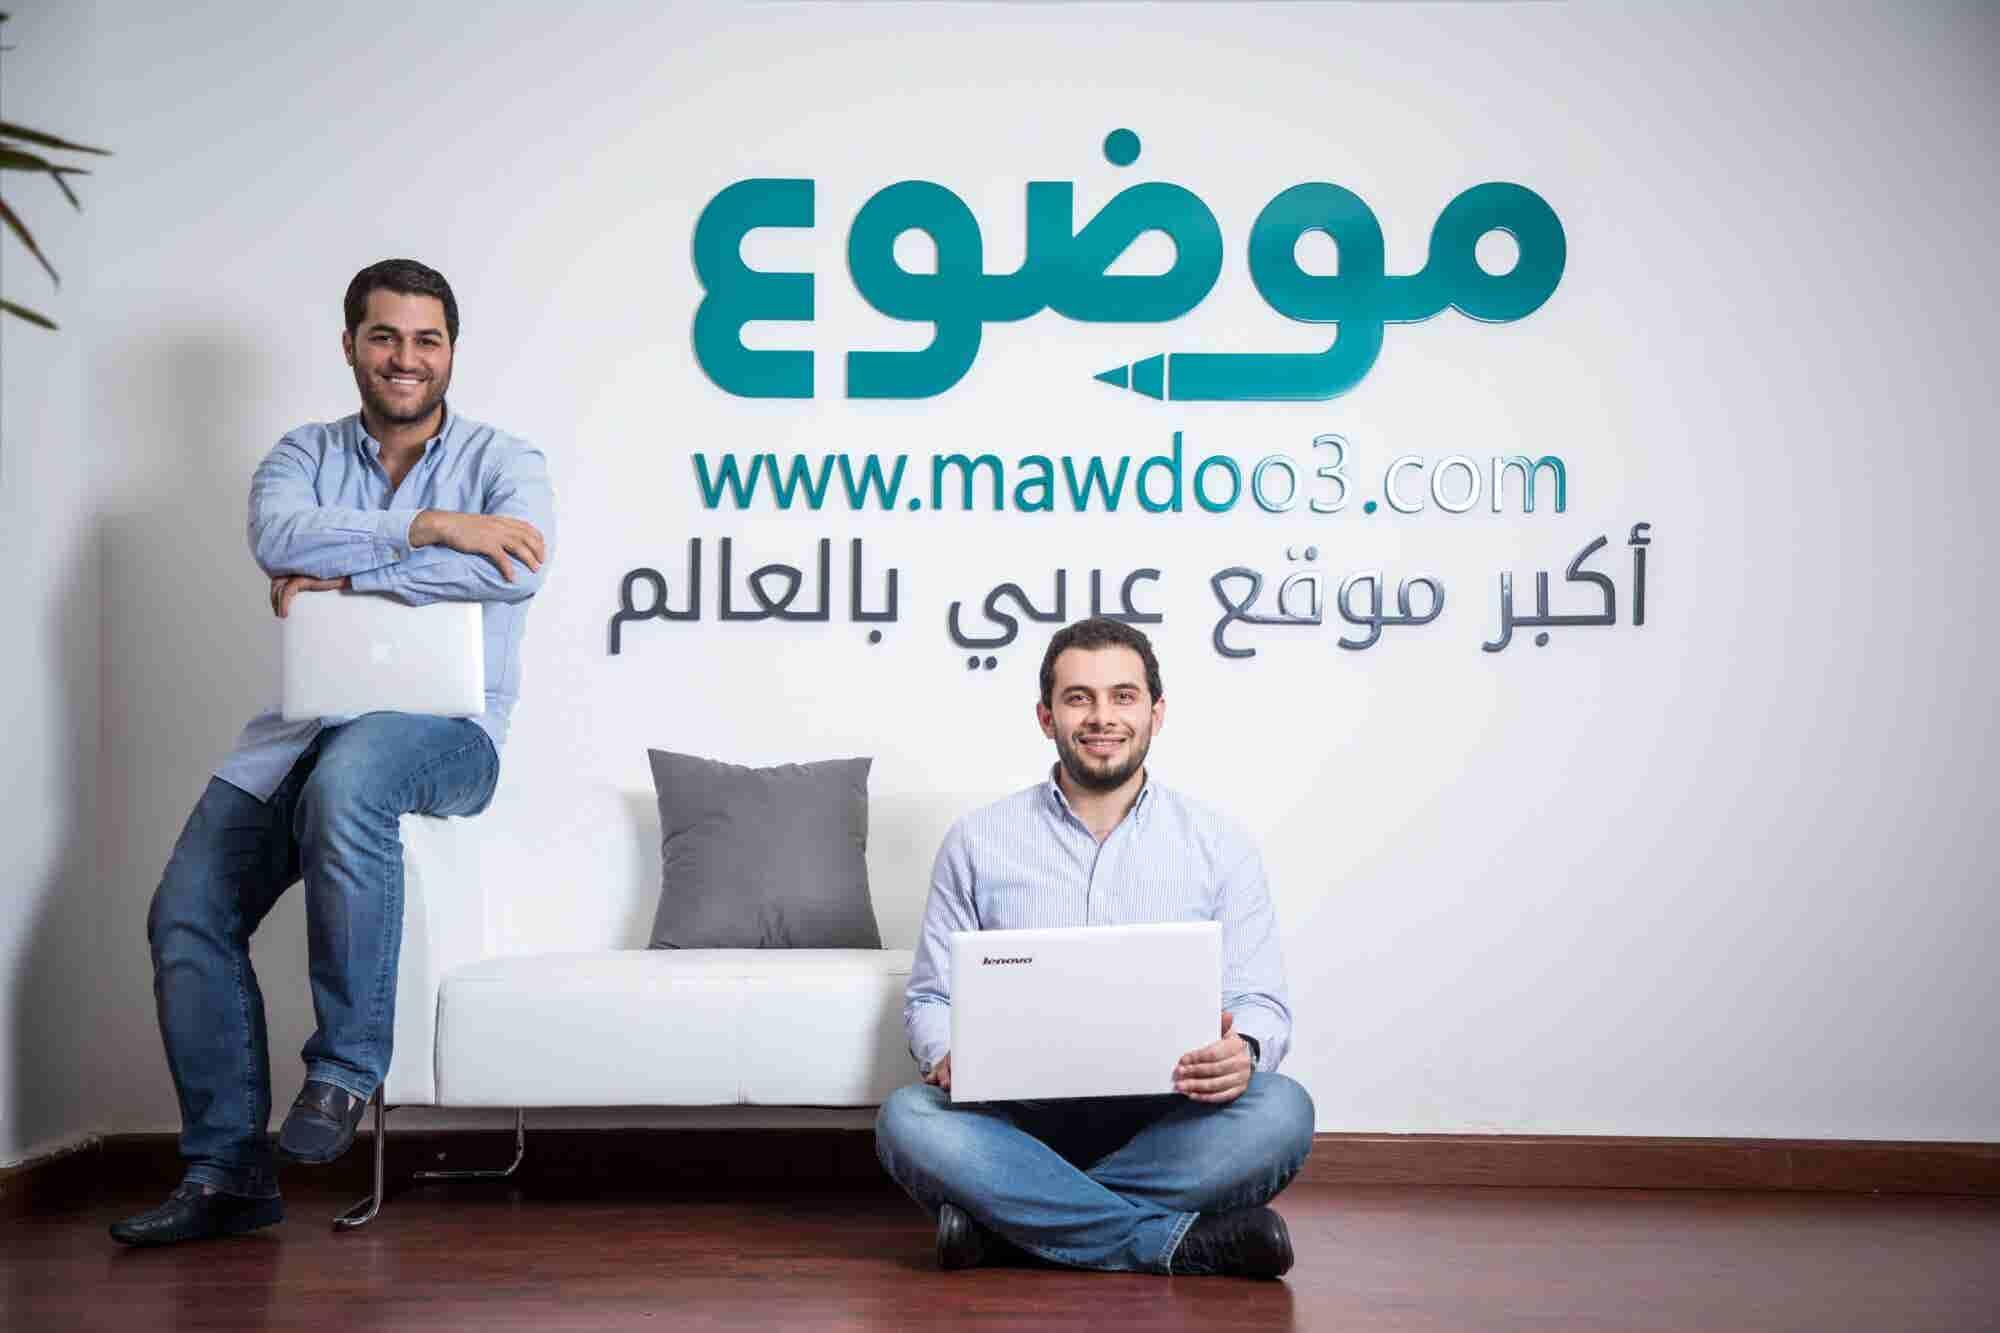 Jordan-Based Arabic Content Platform Mawdoo3 Raises US$13.5 Million In Series B Funding